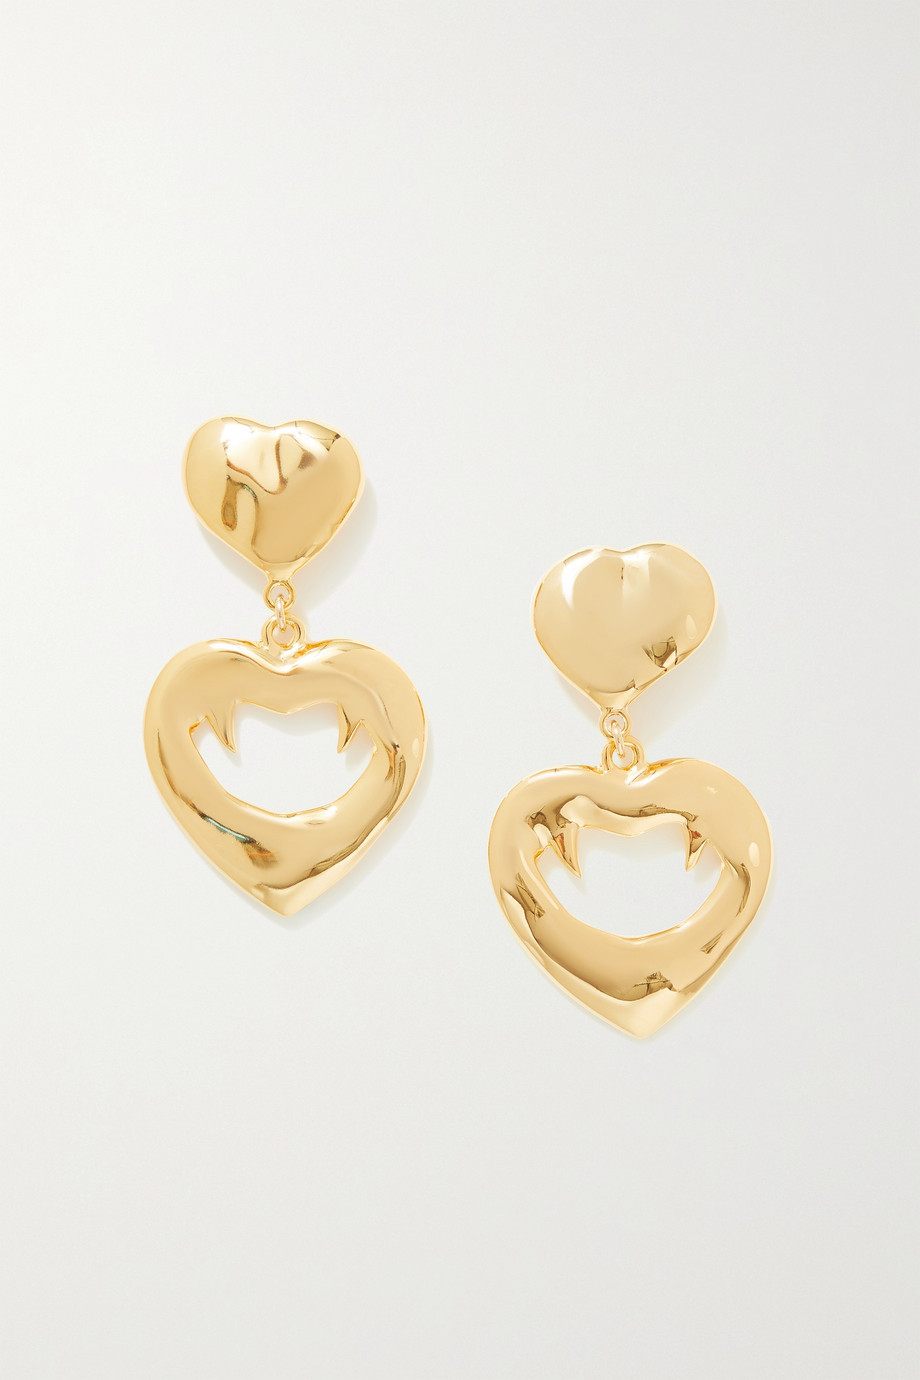 SAINT LAURENT Goldfarbene Oversized-Ohrclips